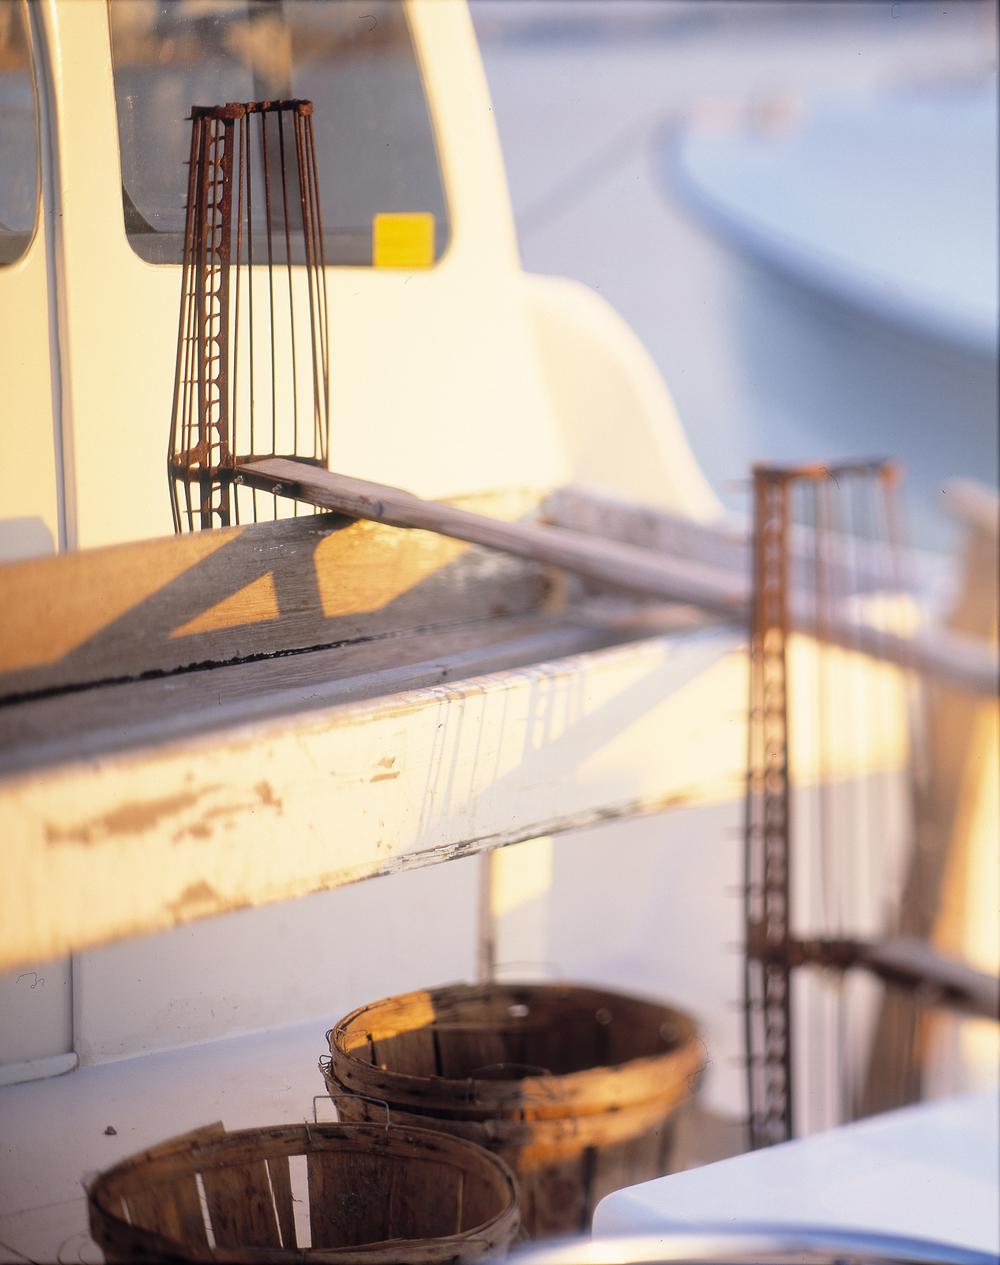 Oyster boat detail 2.jpg